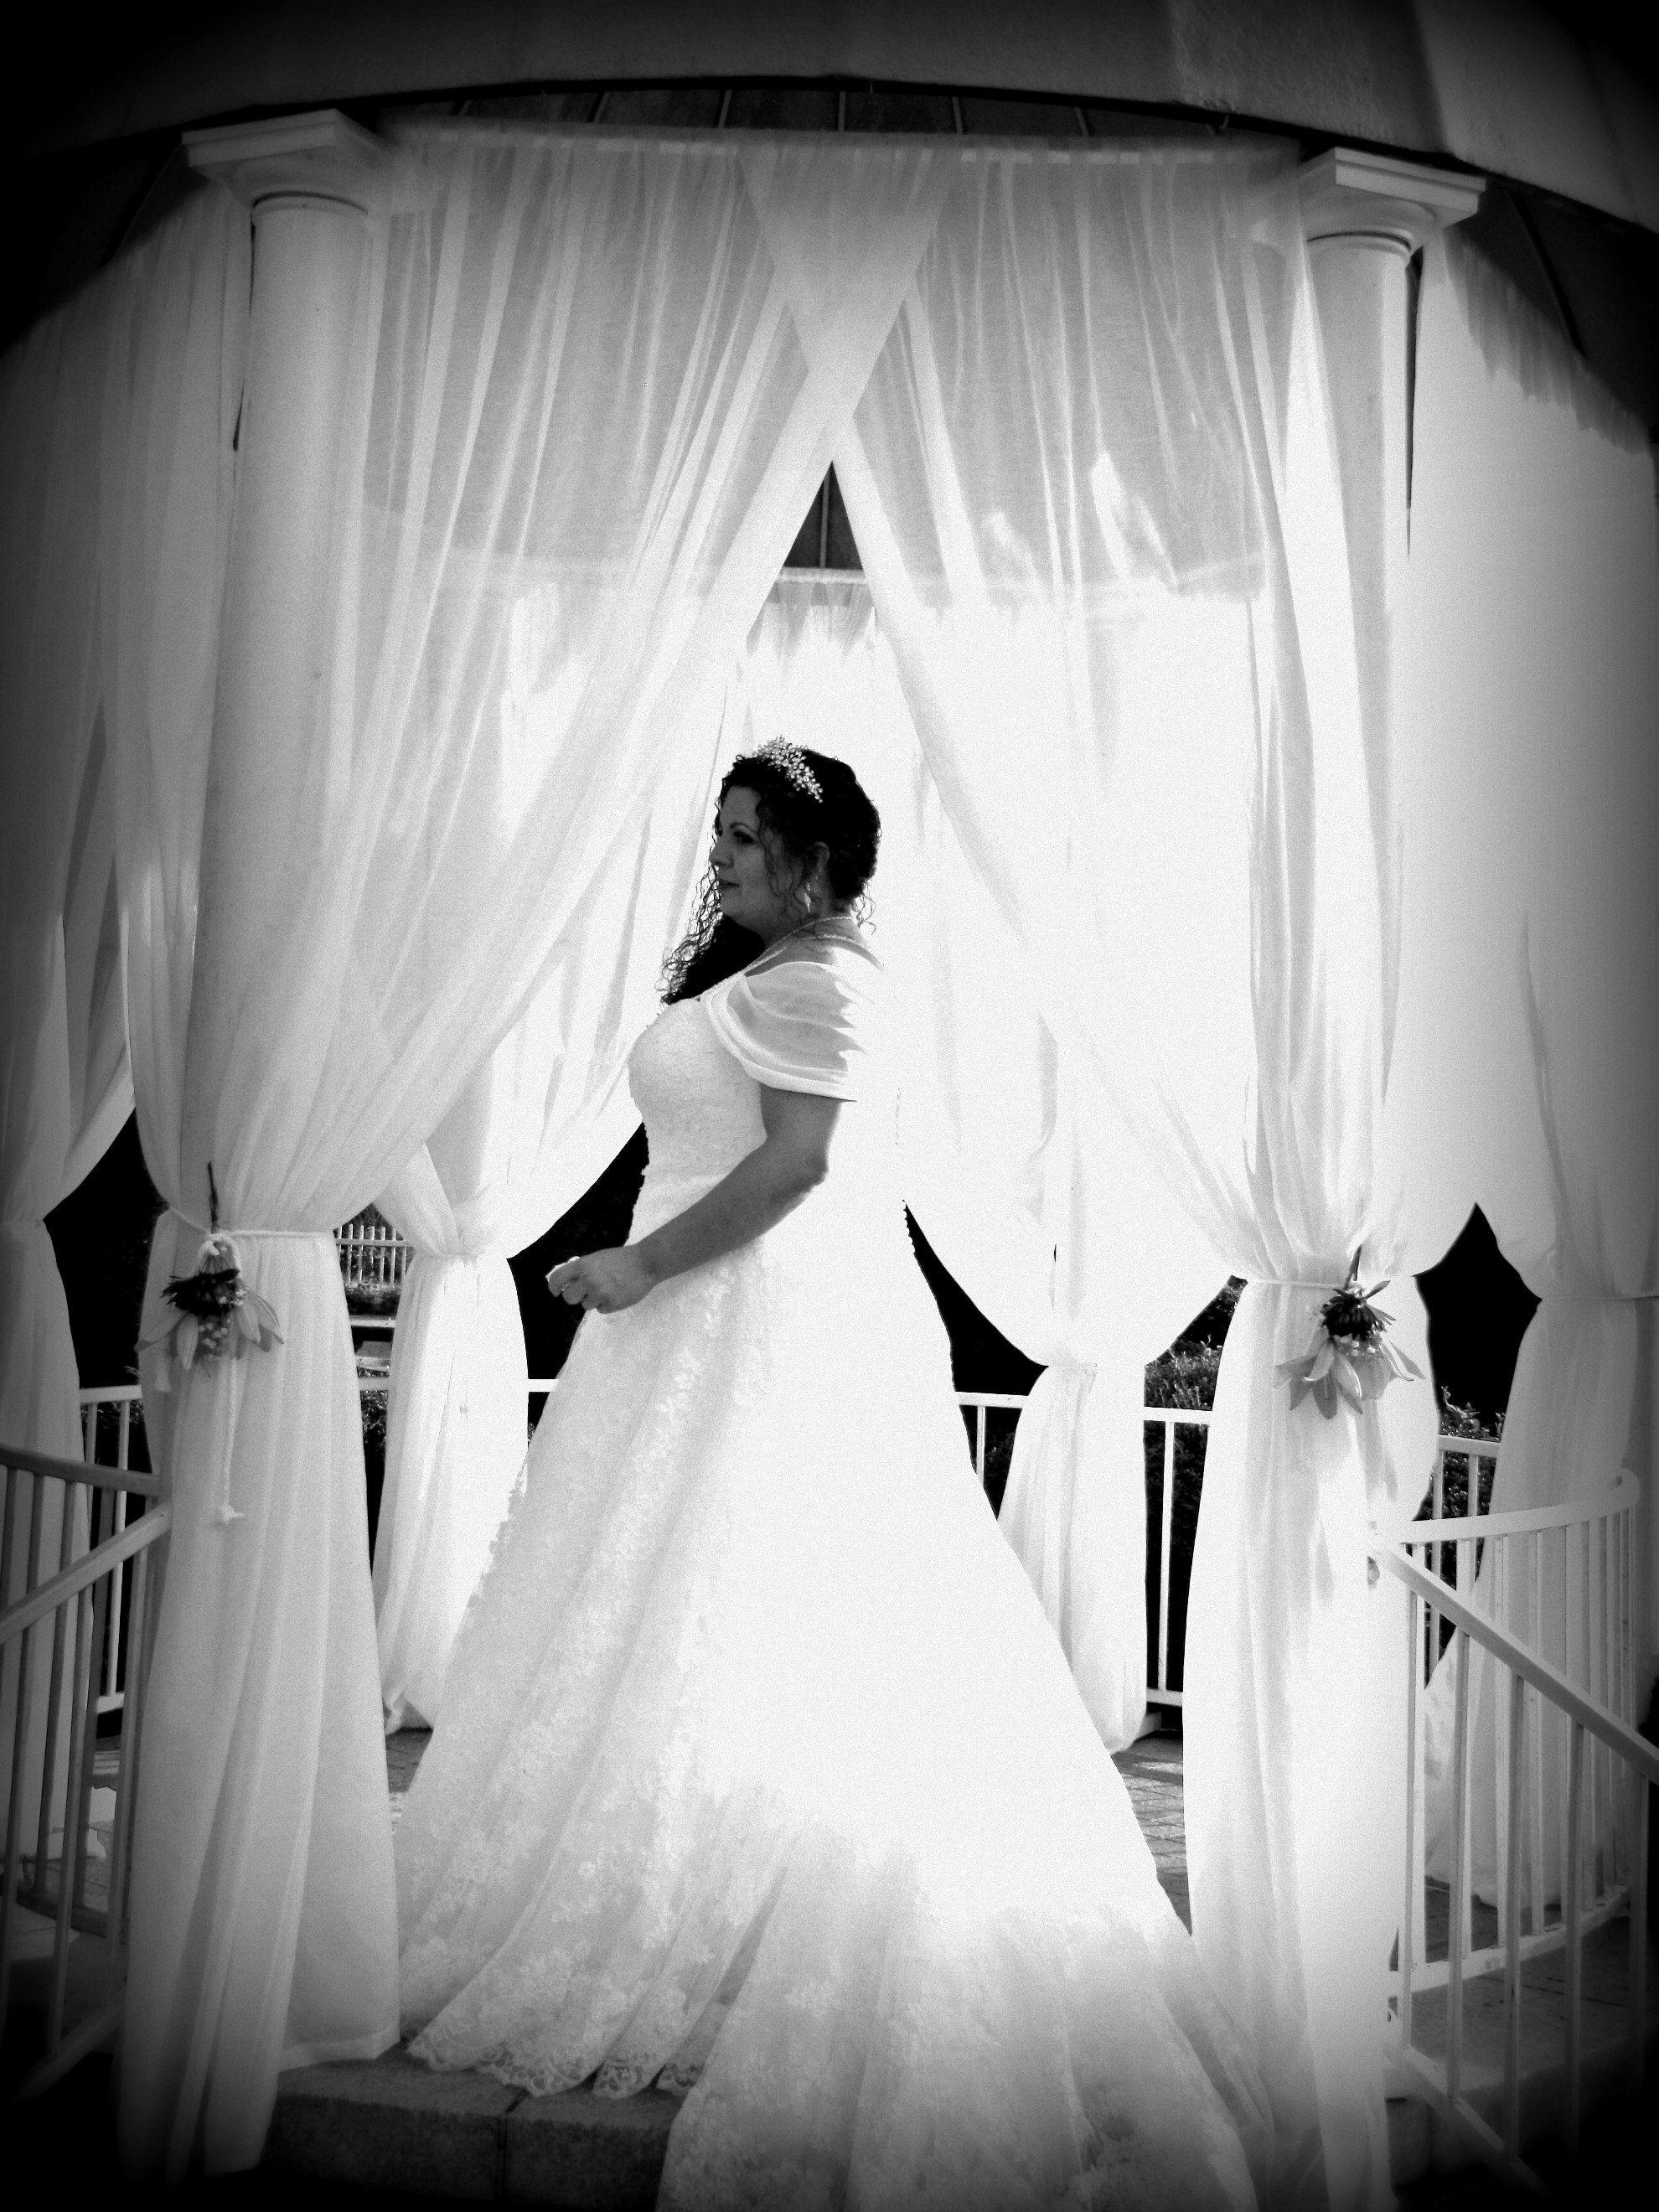 Black And White Bridal Photo Blackhaven Wedding Gardens Lesbian Wedding Plus Size Bride Plus Size Bride Lesbian Wedding White Bridal